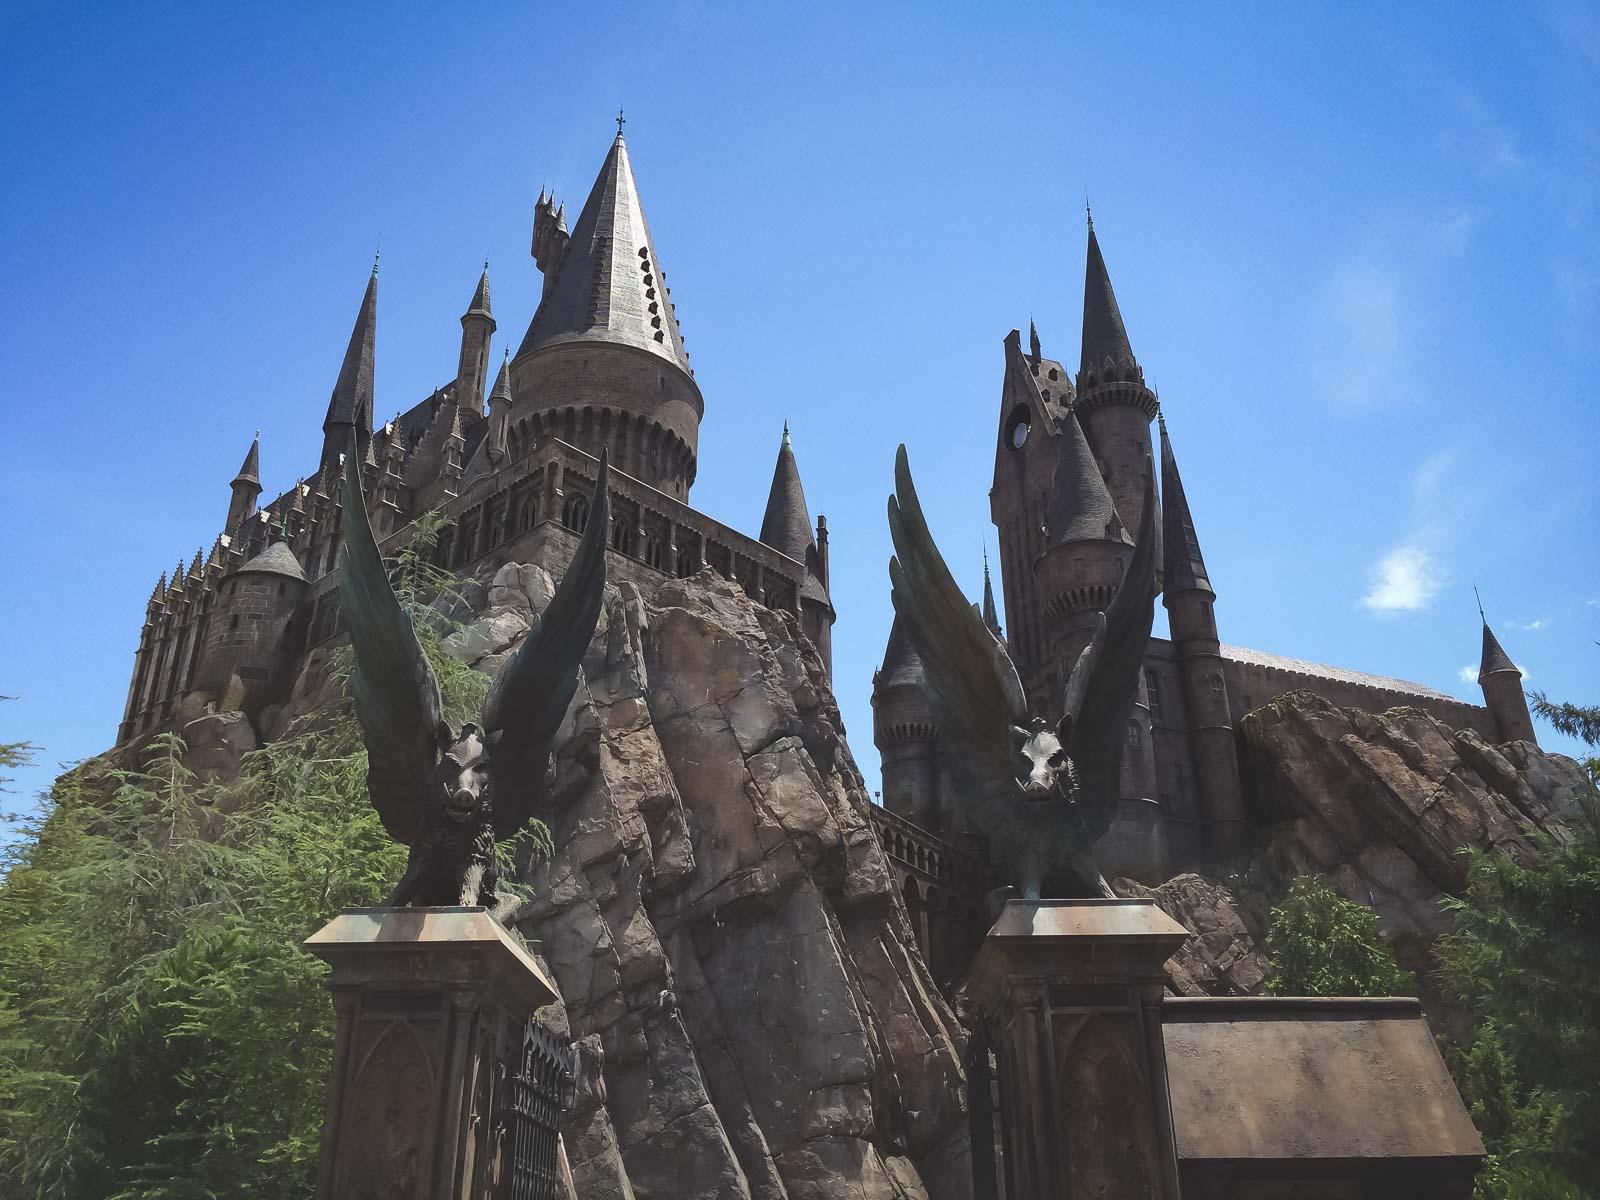 Harry potter at Universal Studios Orlando florida